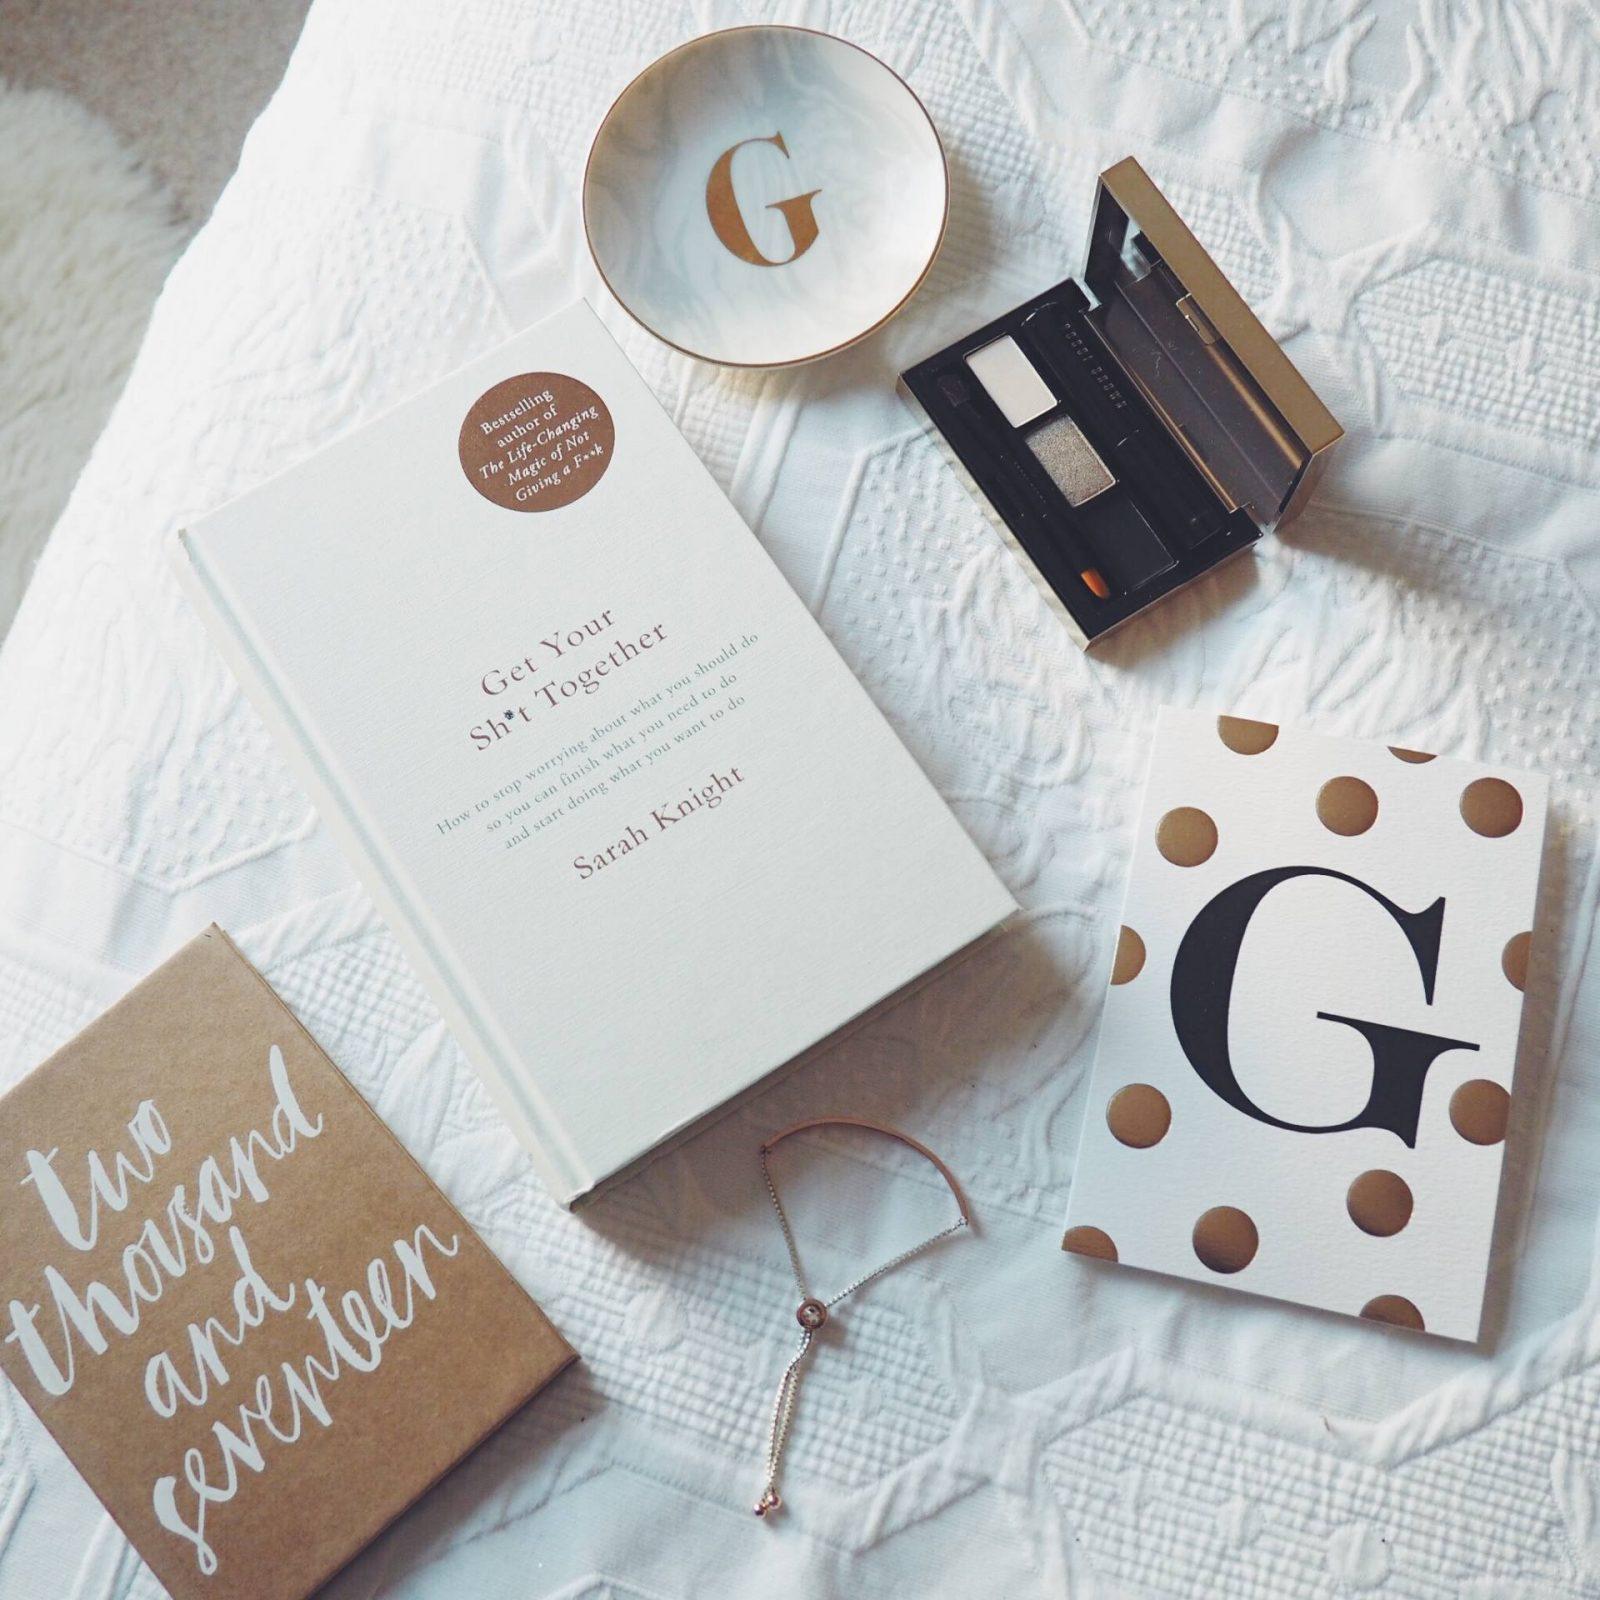 Blog post goals for 2017